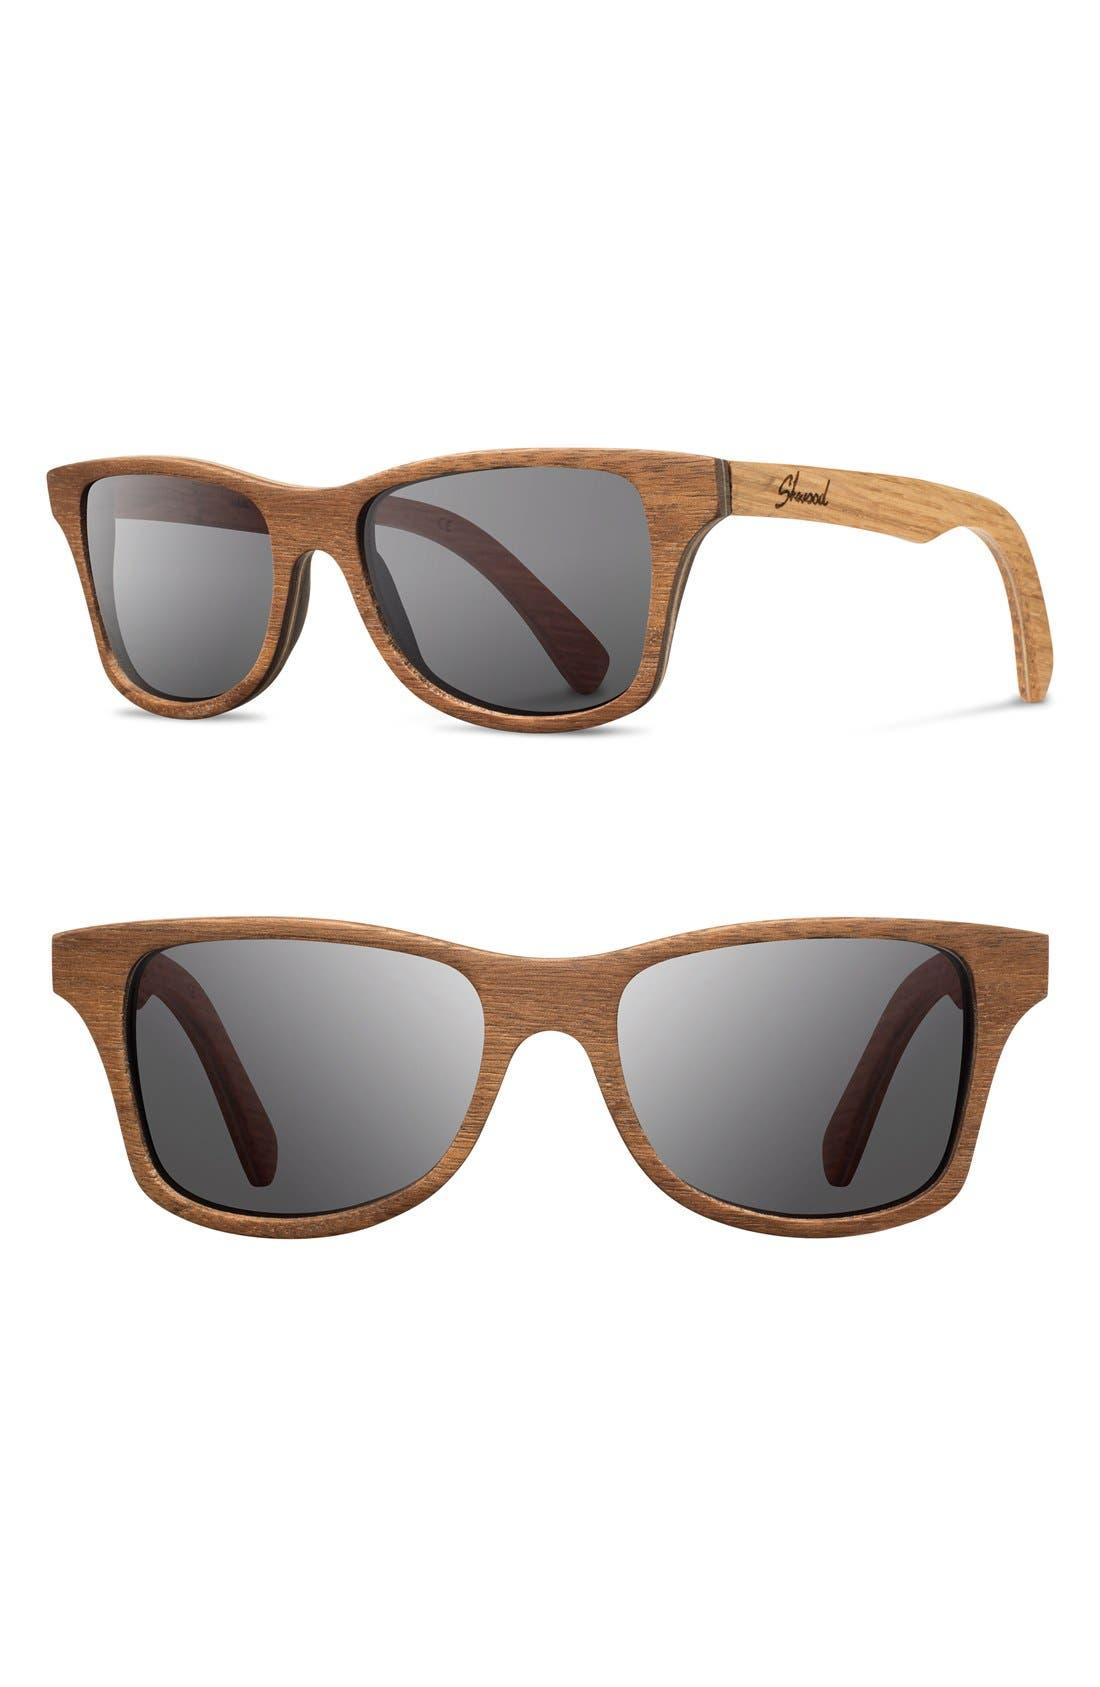 Main Image - Shwood 'Canby' 54mm Wood Sunglasses